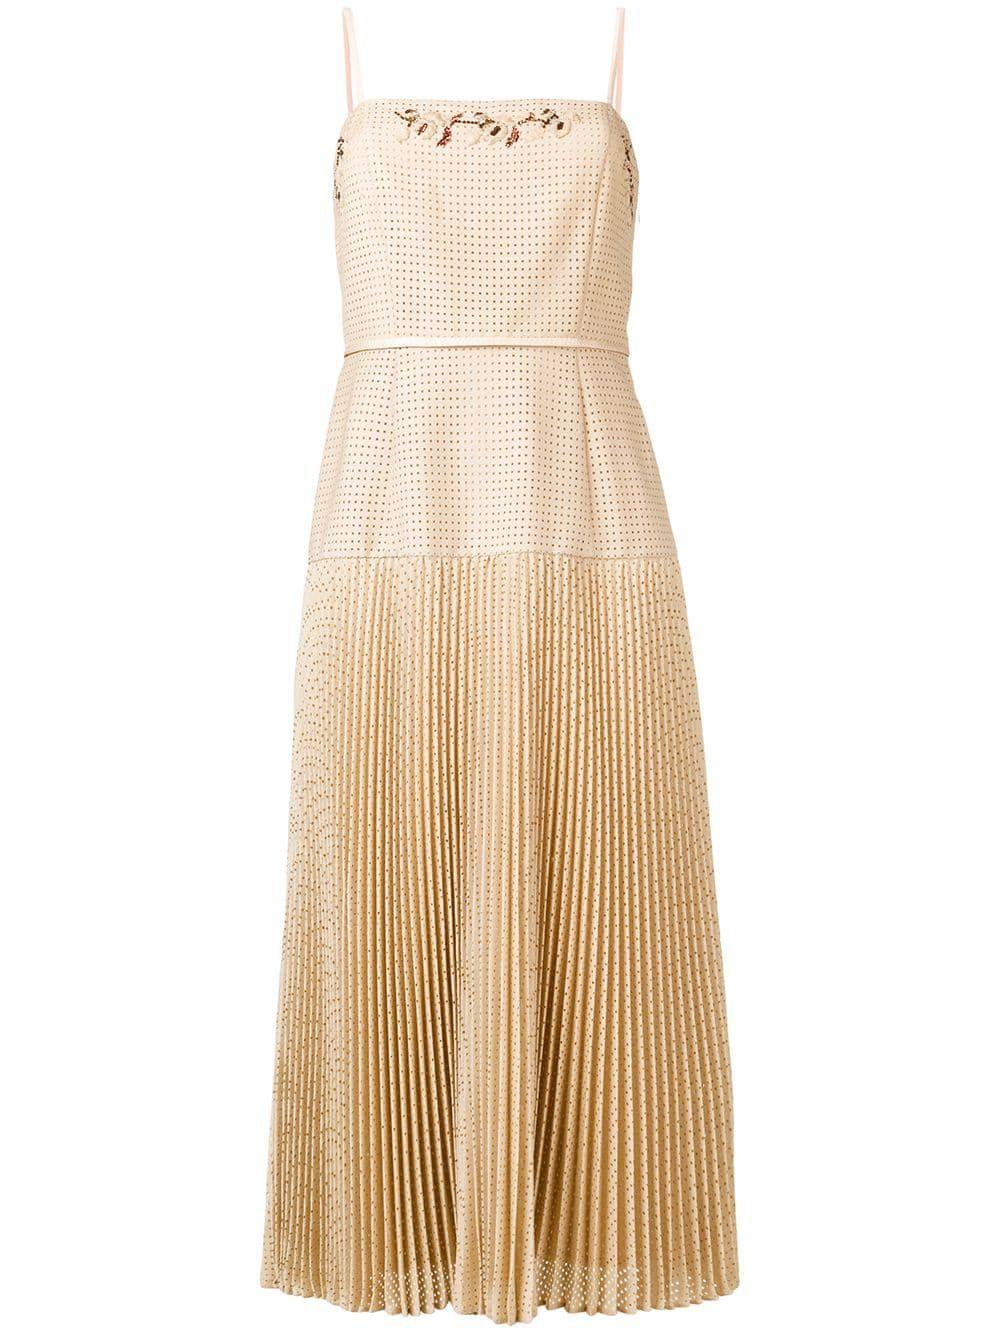 Fendi Perforated Pleated Dress Farfetch Pleated Dress Fendi Dress Gold Dress Casual [ 1334 x 1000 Pixel ]